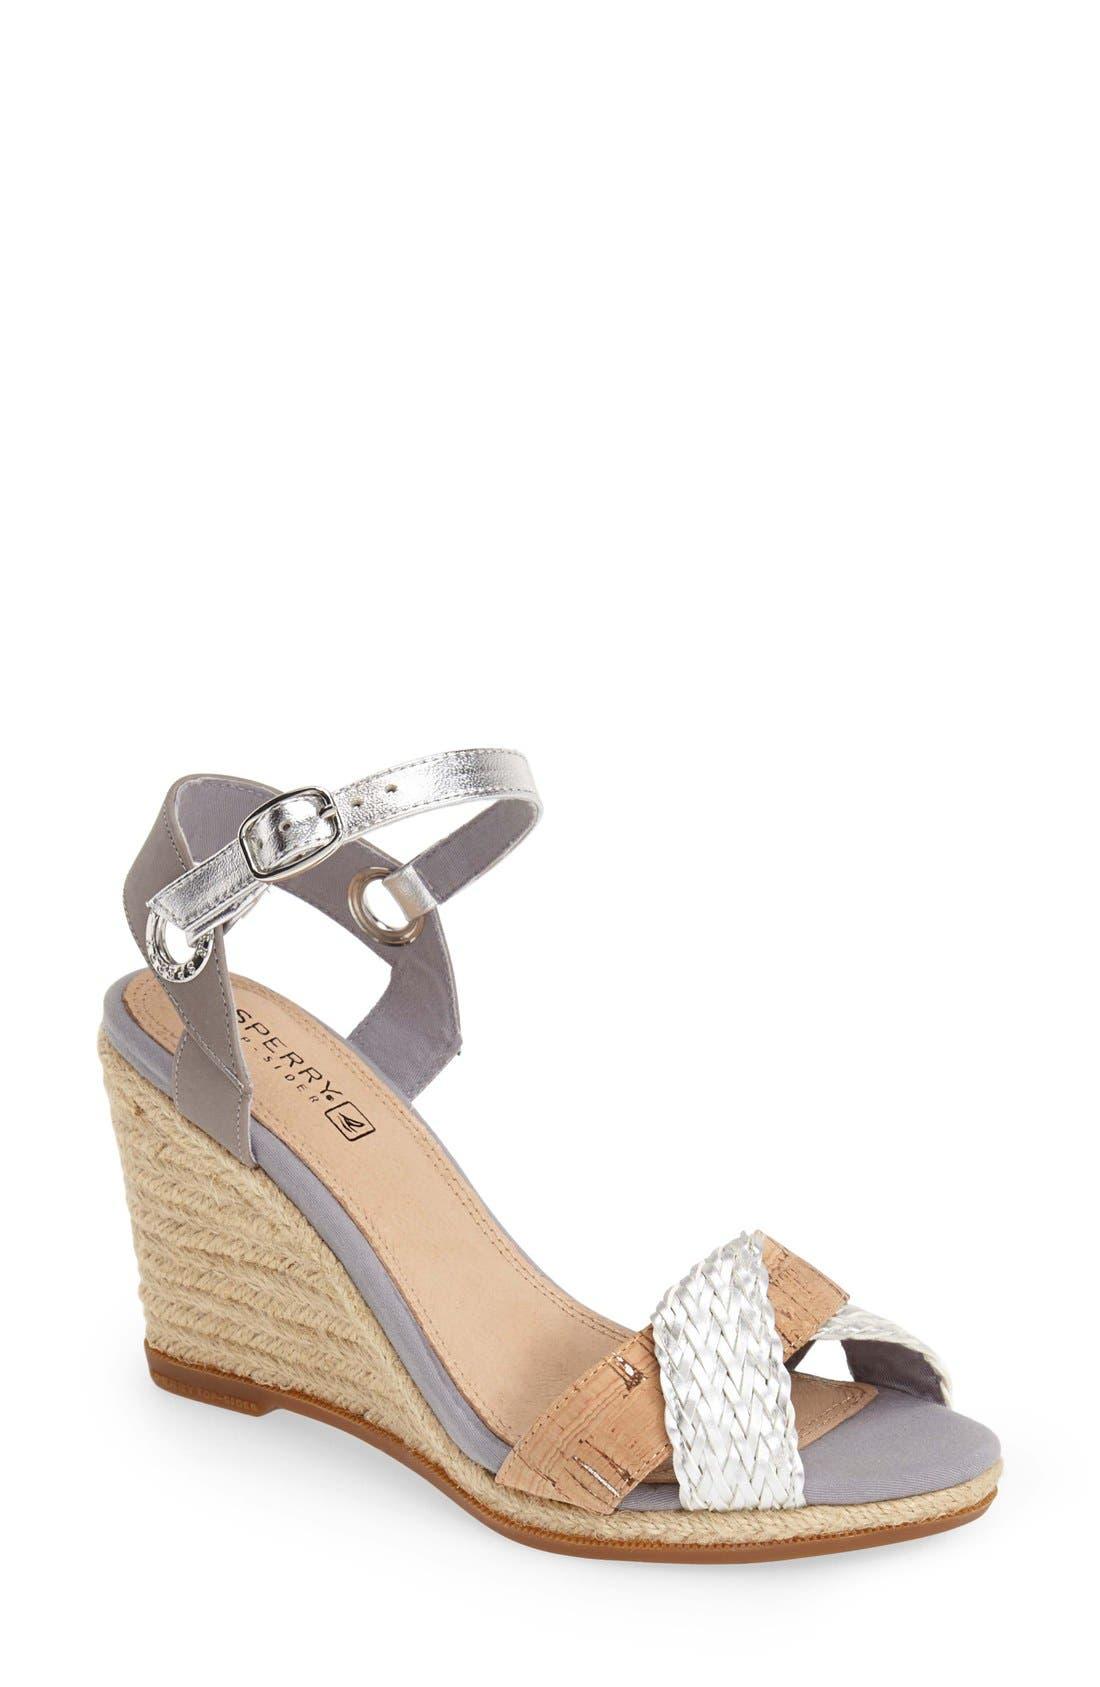 Main Image - Sperry 'Saylor' Sandal (Women)